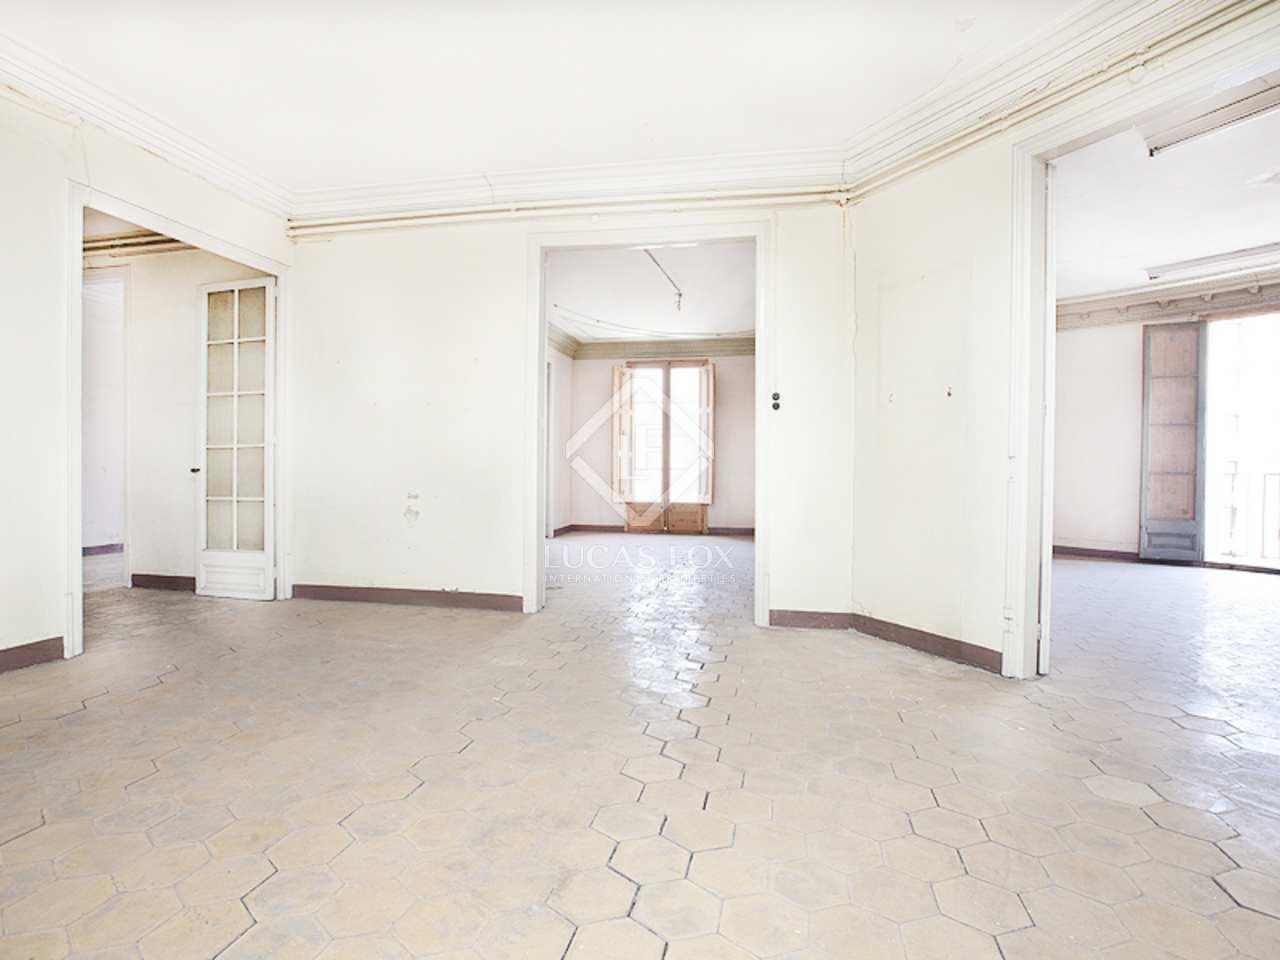 Appartement unique r nover vendre ciutat vella barcelone - Acheter appartement a barcelone ...